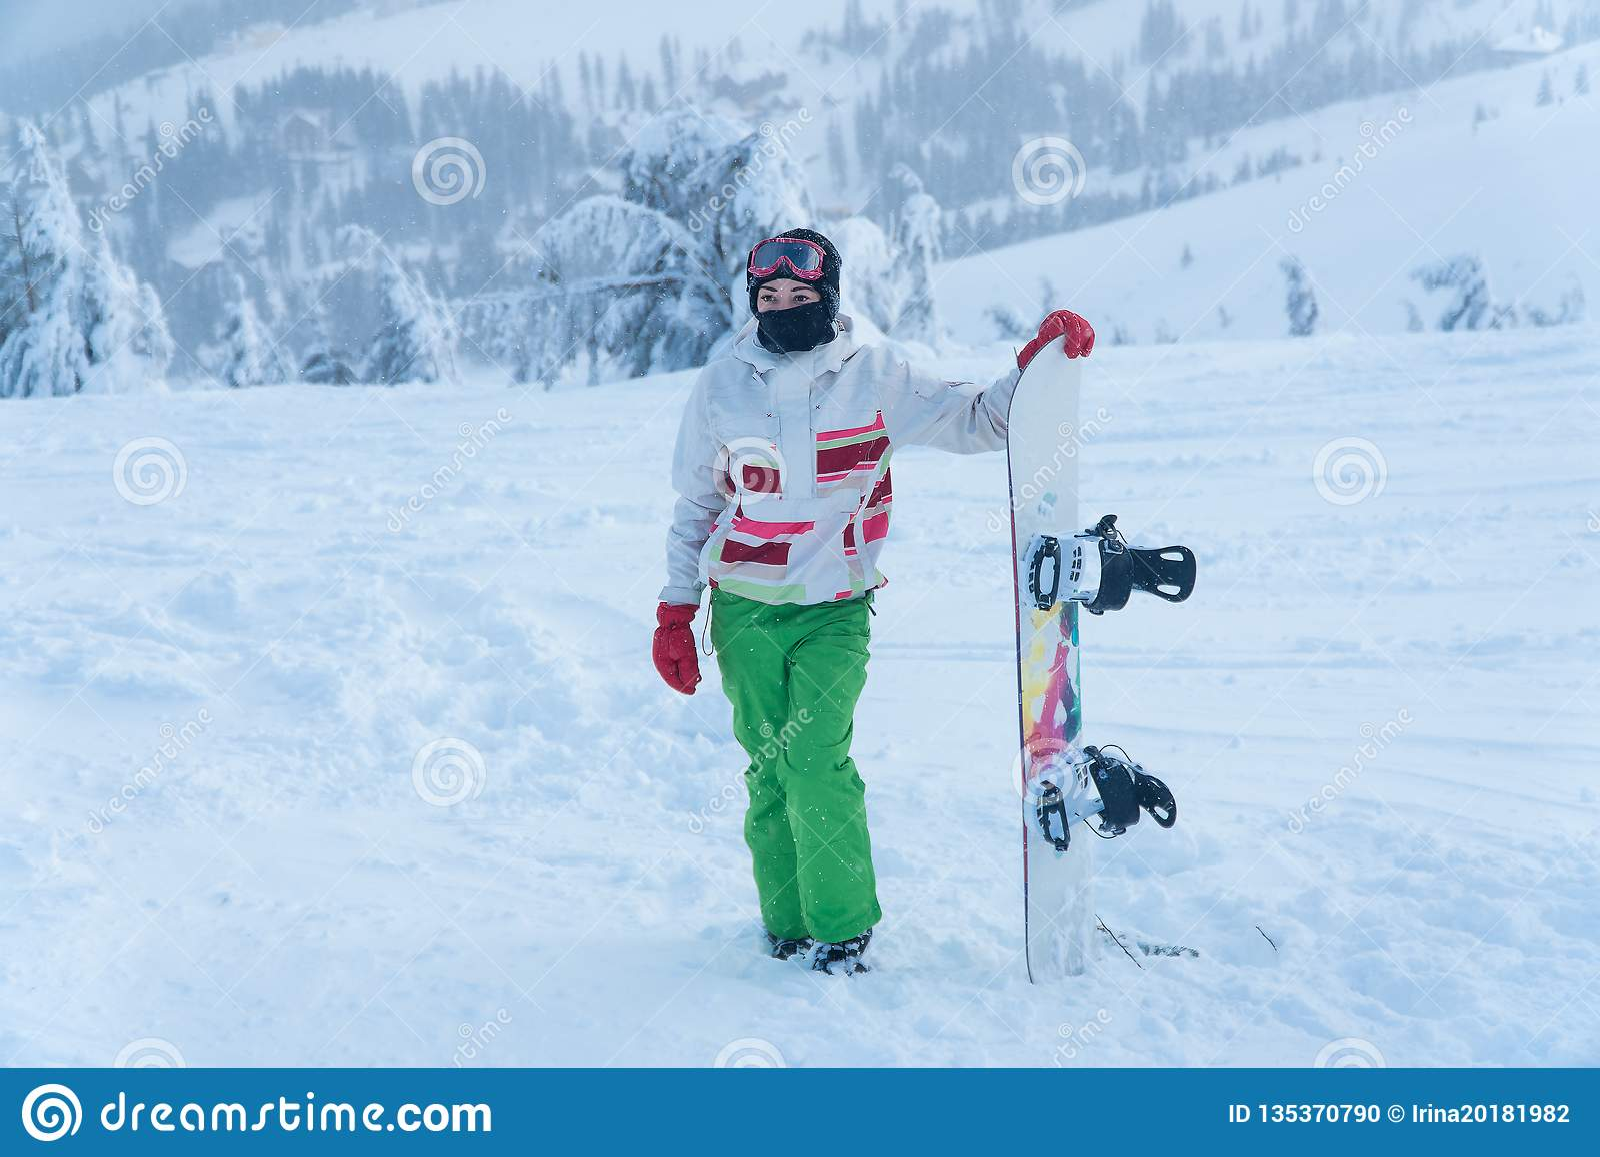 Woman snowboard. snowboarder. winter snow snowboard